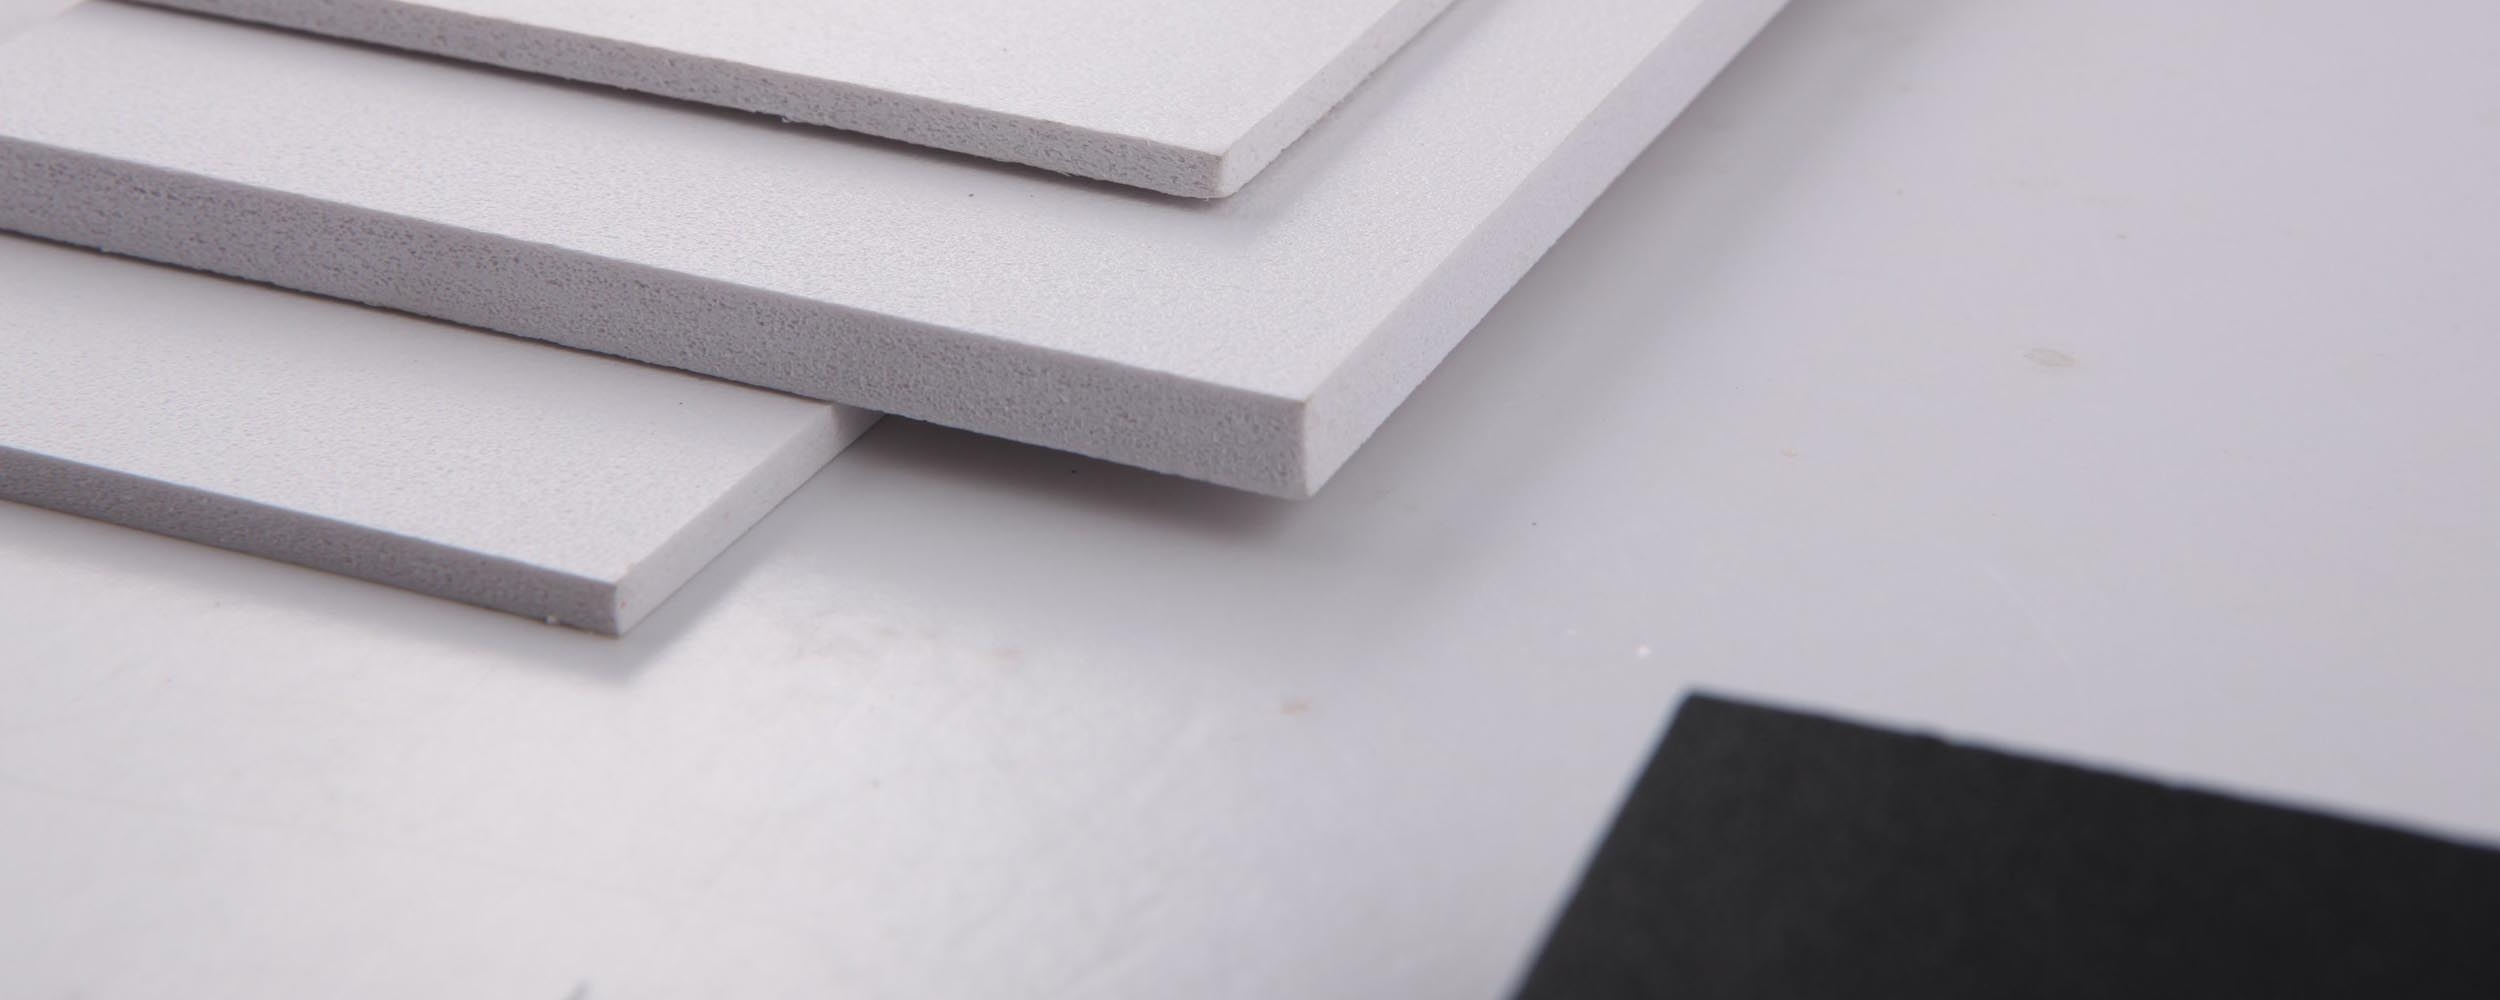 Tấm Nhựa PVC (@tampvcorg) Cover Image